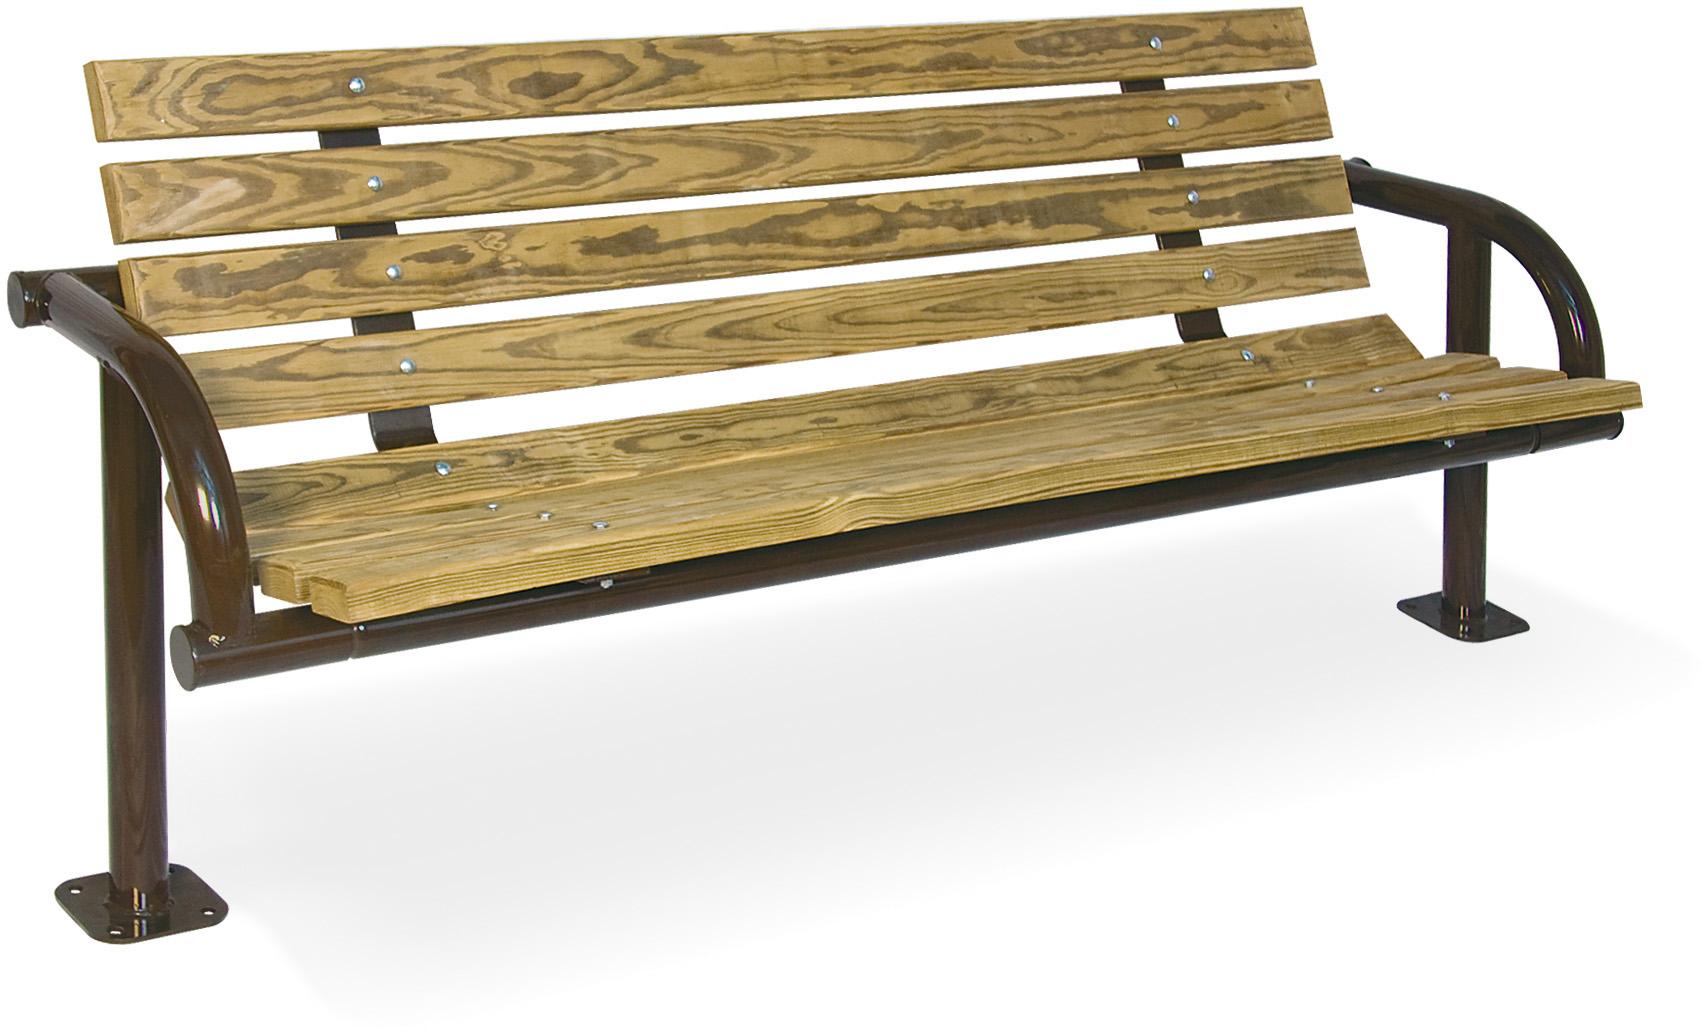 Single-Post Contour Wood Bench